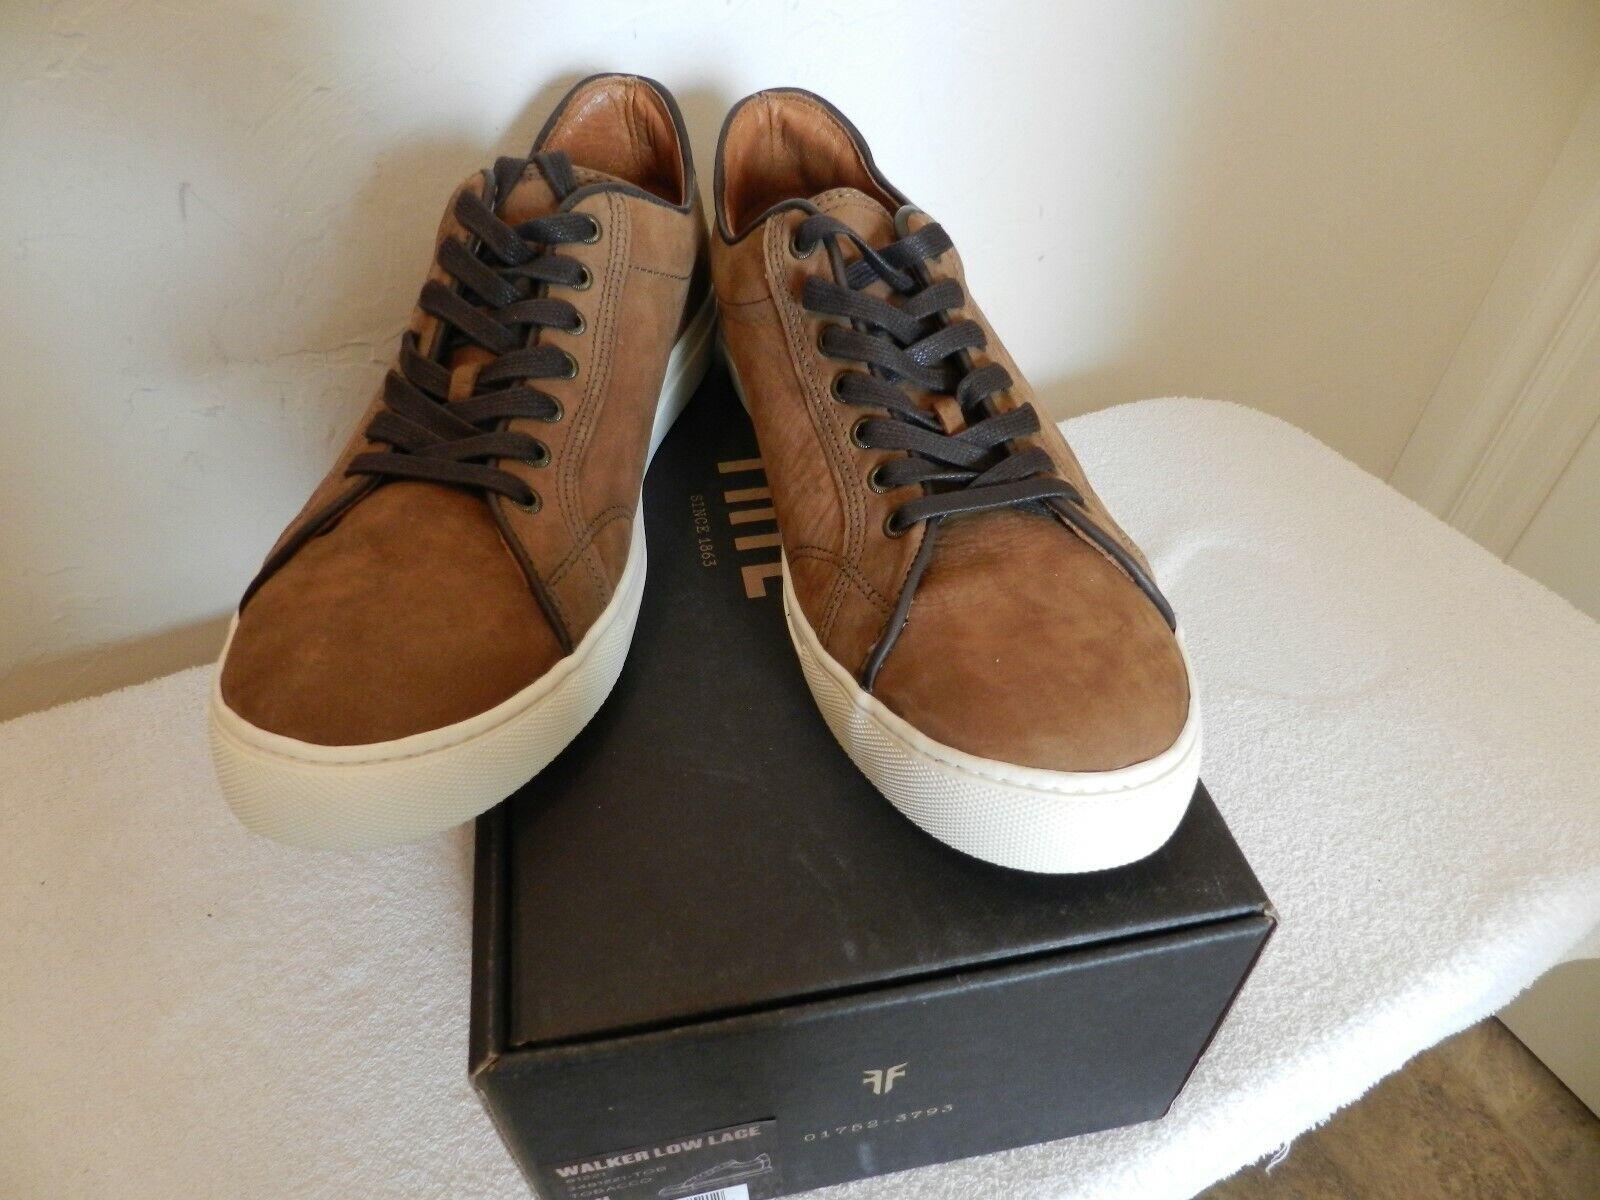 Frye Walker Low Lace 11M Nubuck Brown Leather sneakers  298 NIB USA